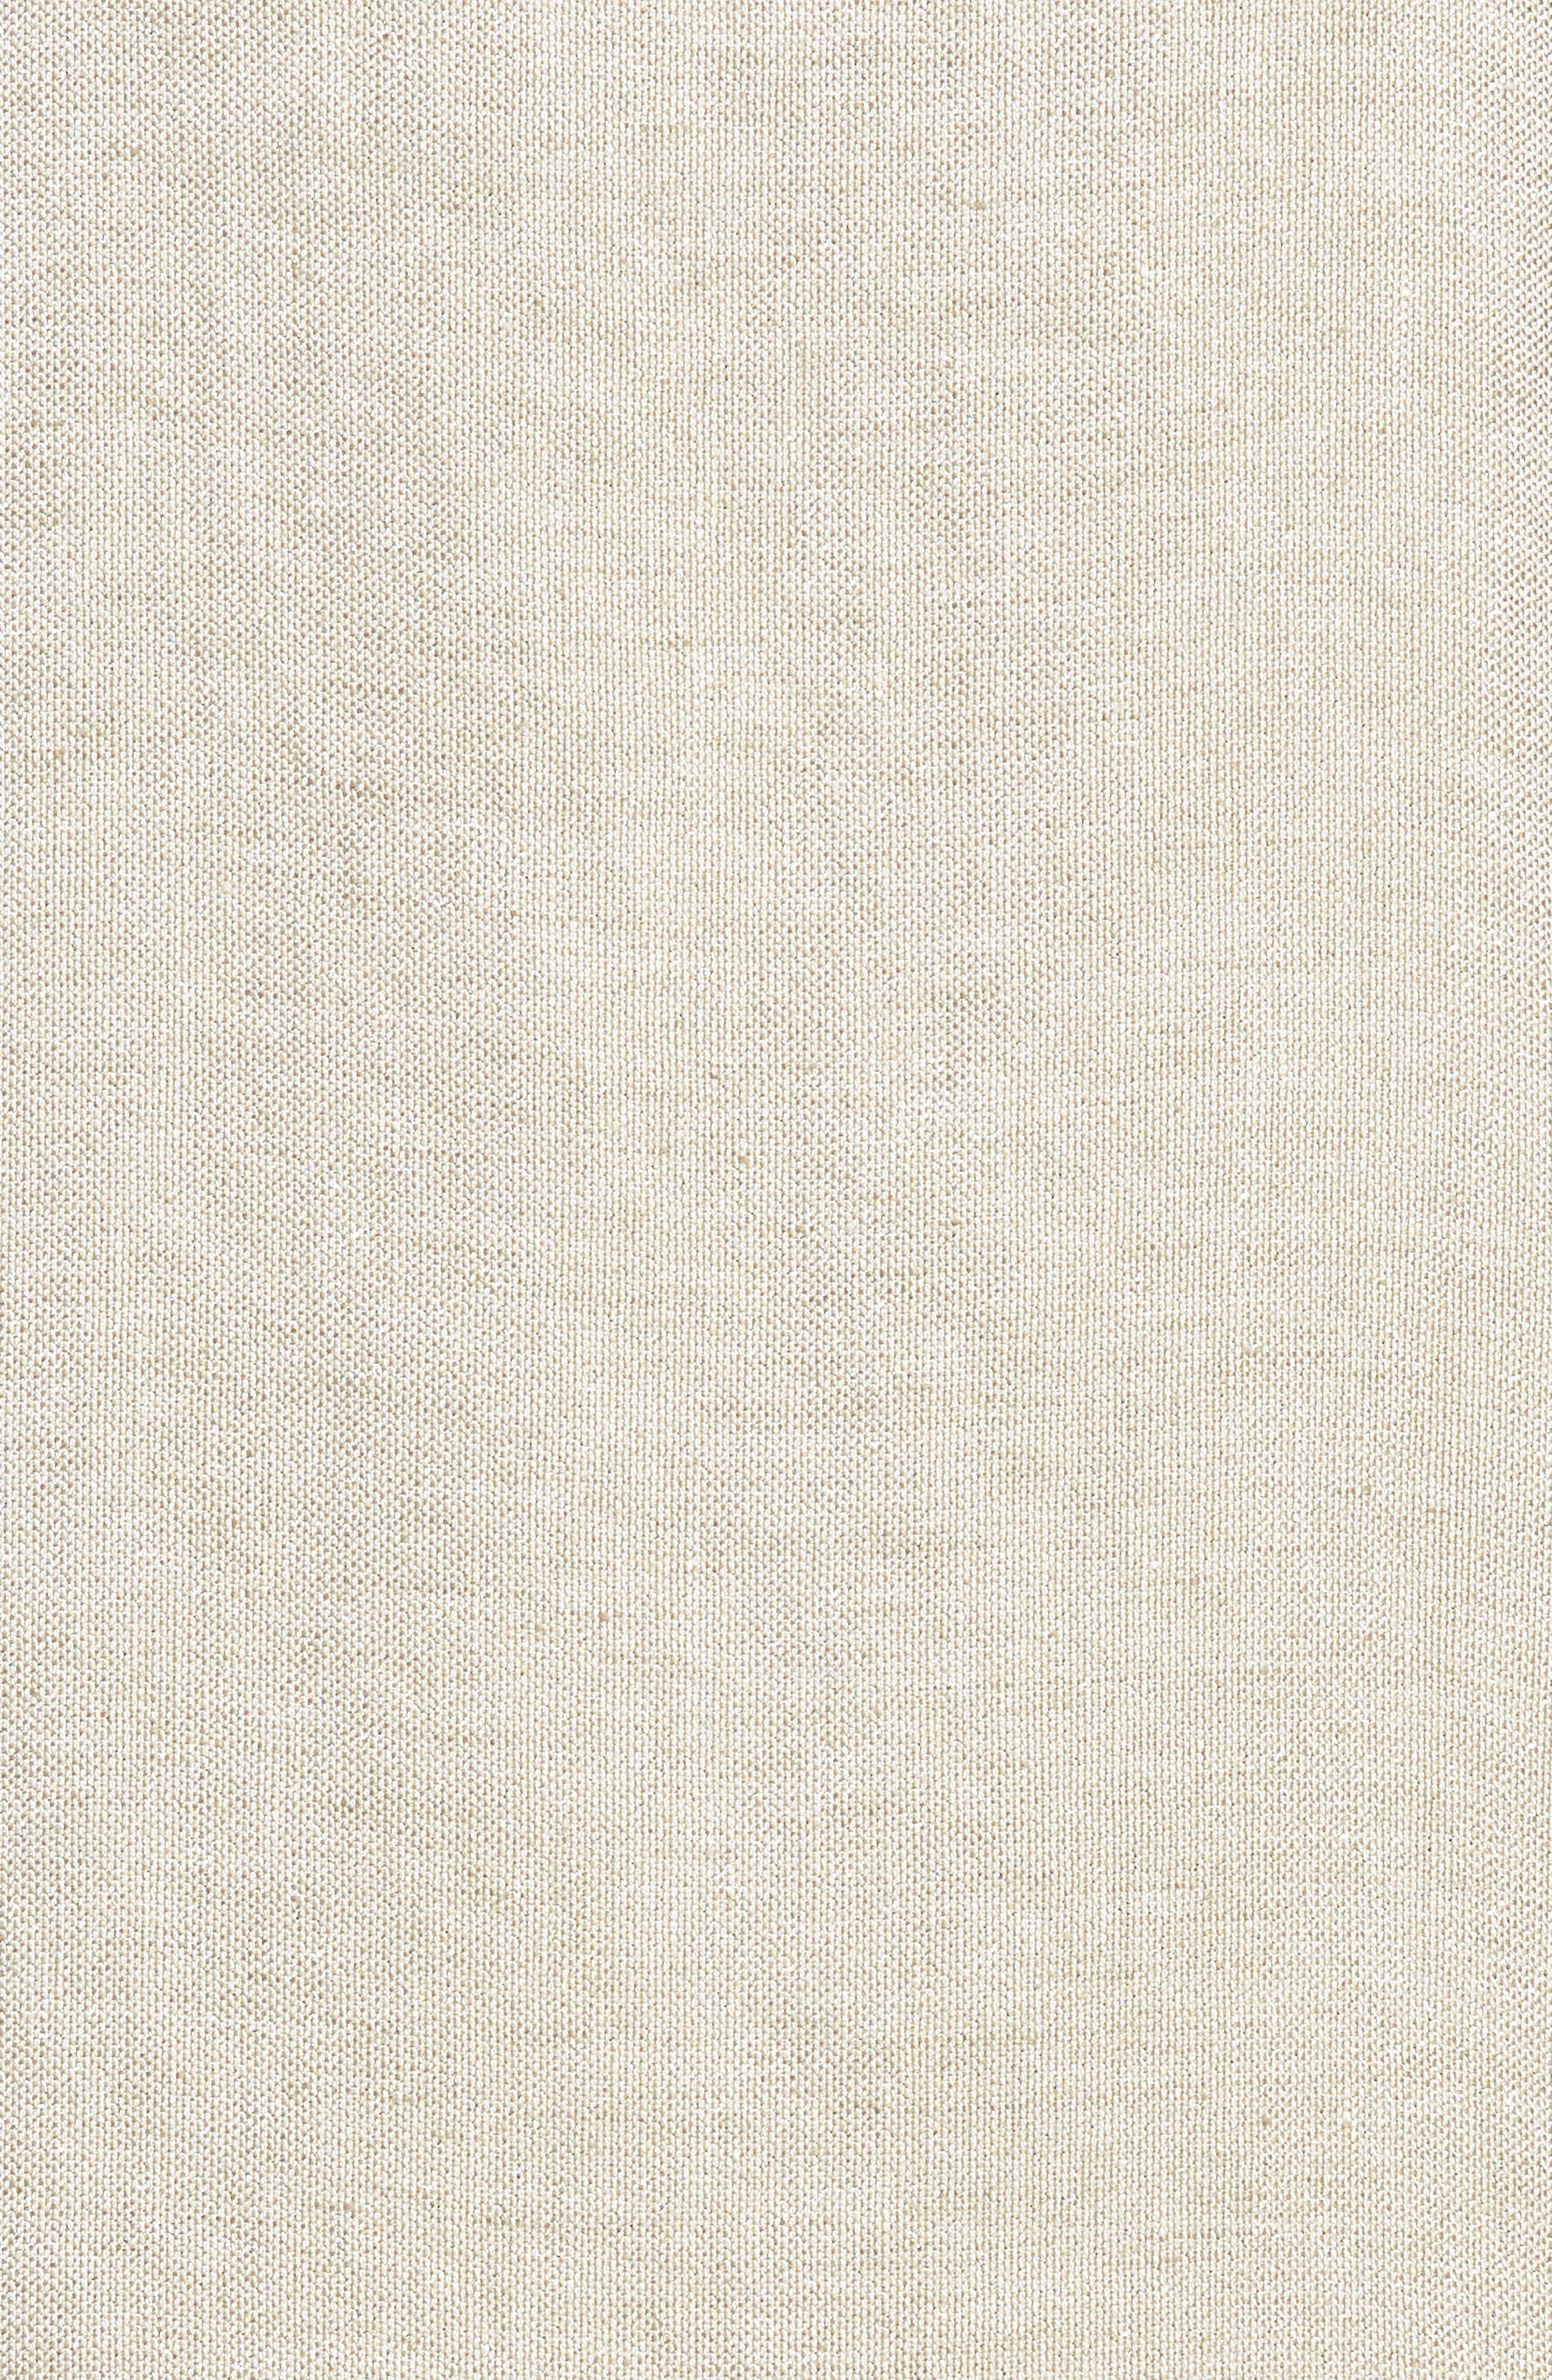 Scoop Neck Linen Blend Dress,                             Alternate thumbnail 6, color,                             257